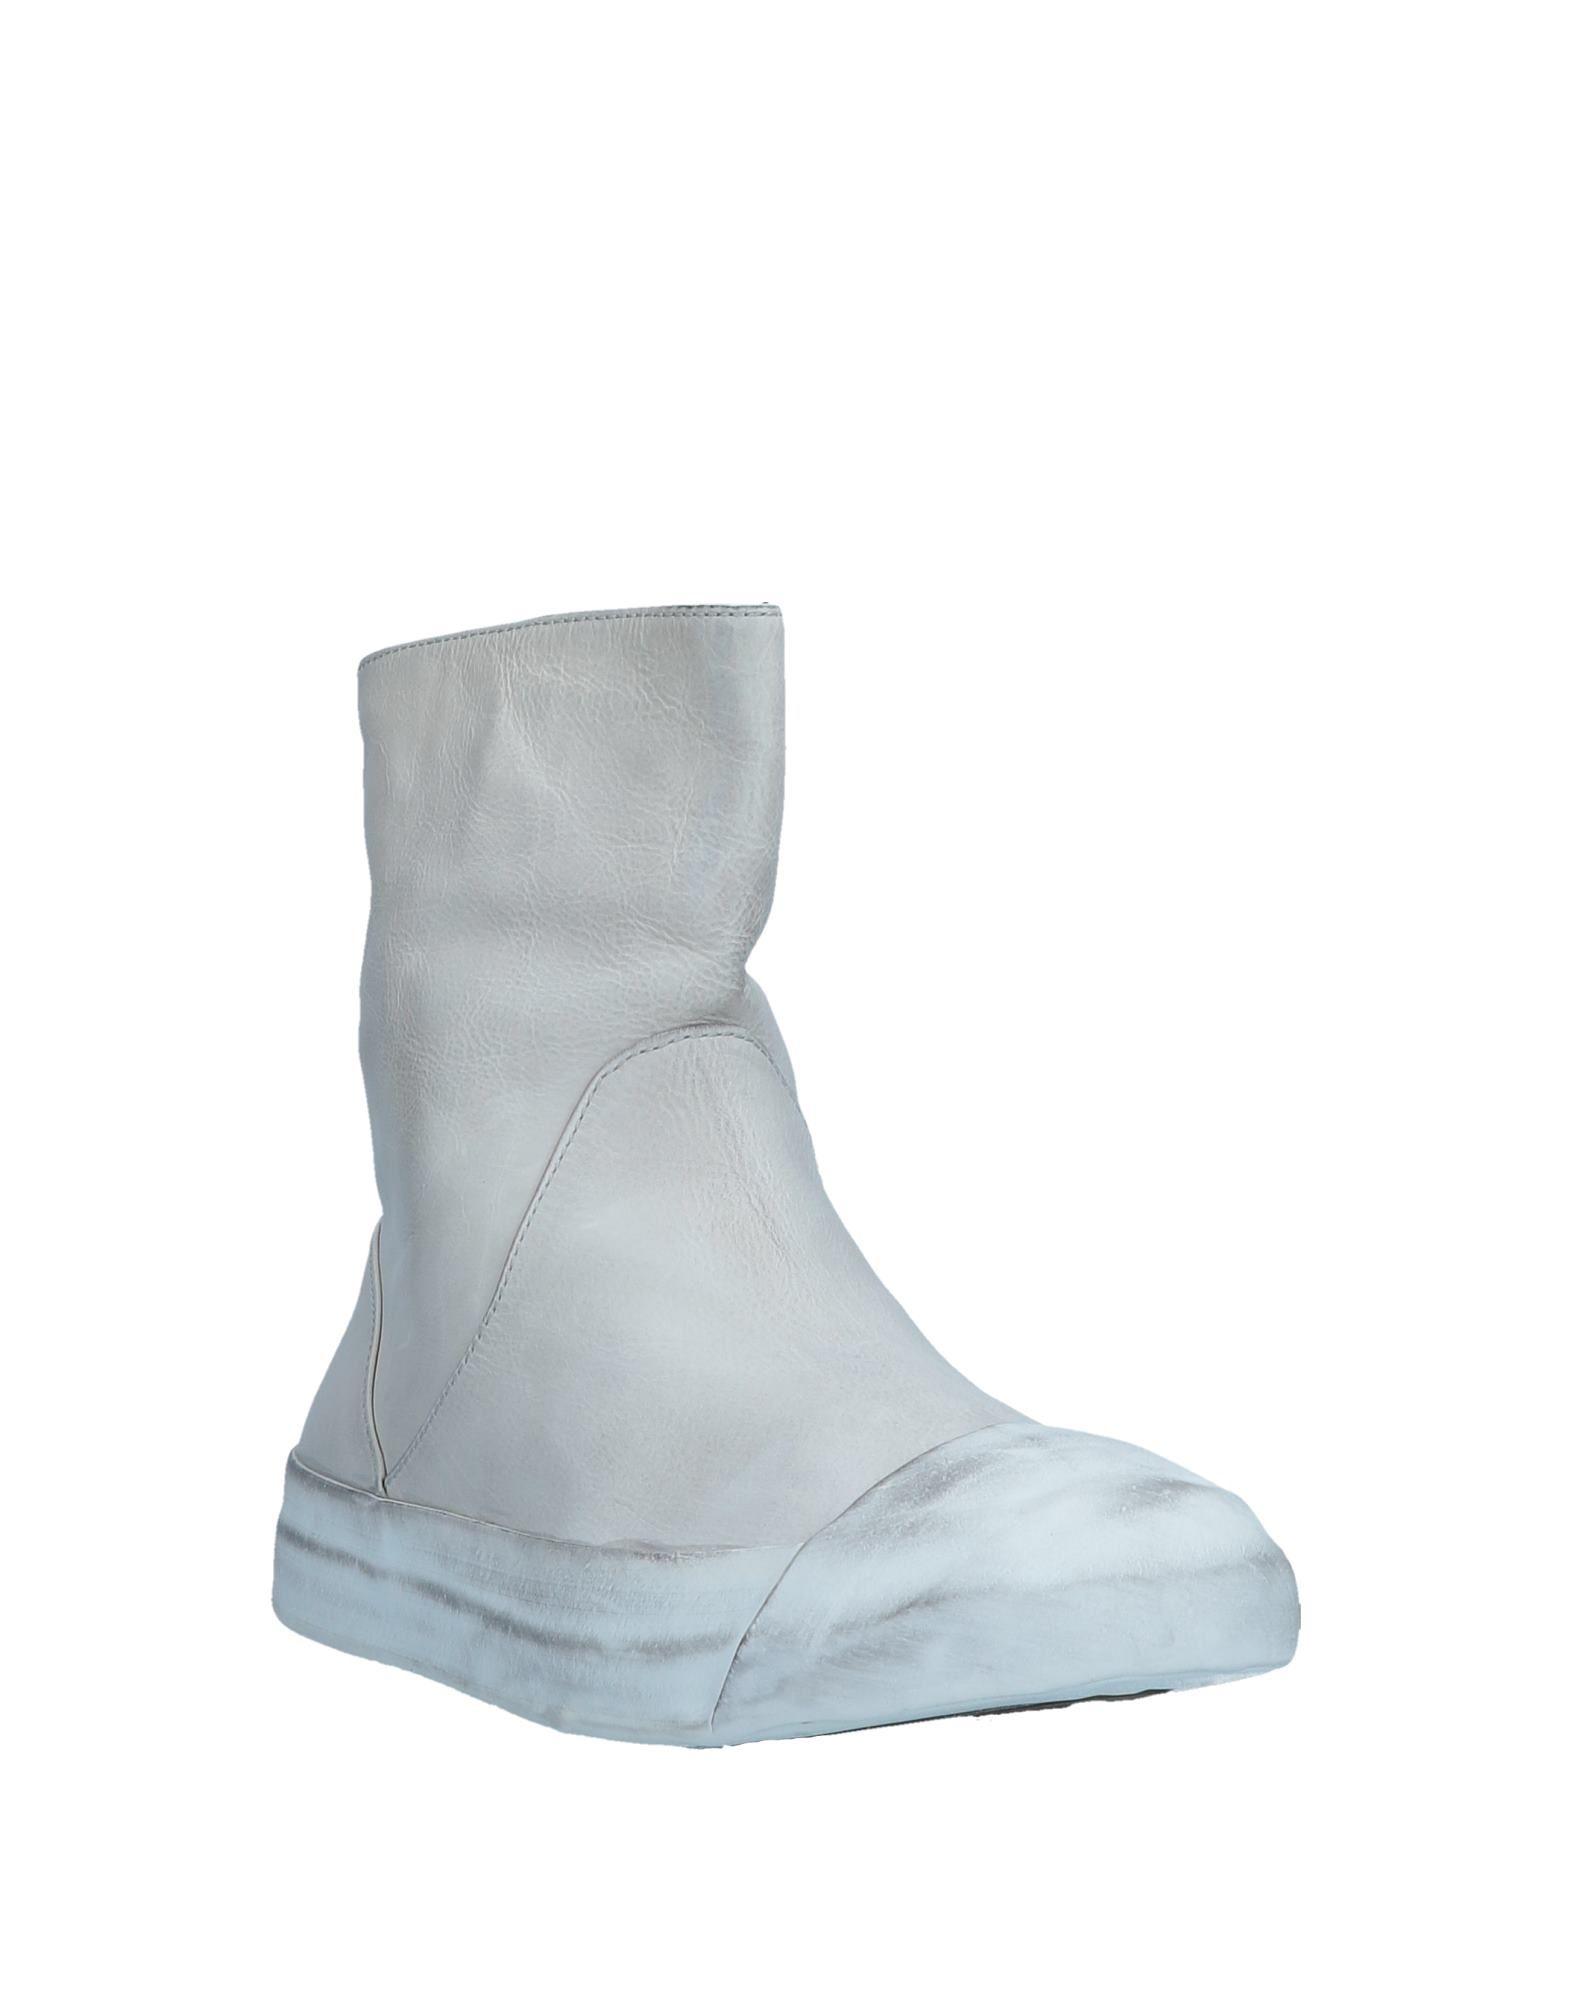 O.X.S. Sneakers Damen Gutes Preis-Leistungs-Verhältnis, Preis-Leistungs-Verhältnis, Preis-Leistungs-Verhältnis, es lohnt sich ba7d26